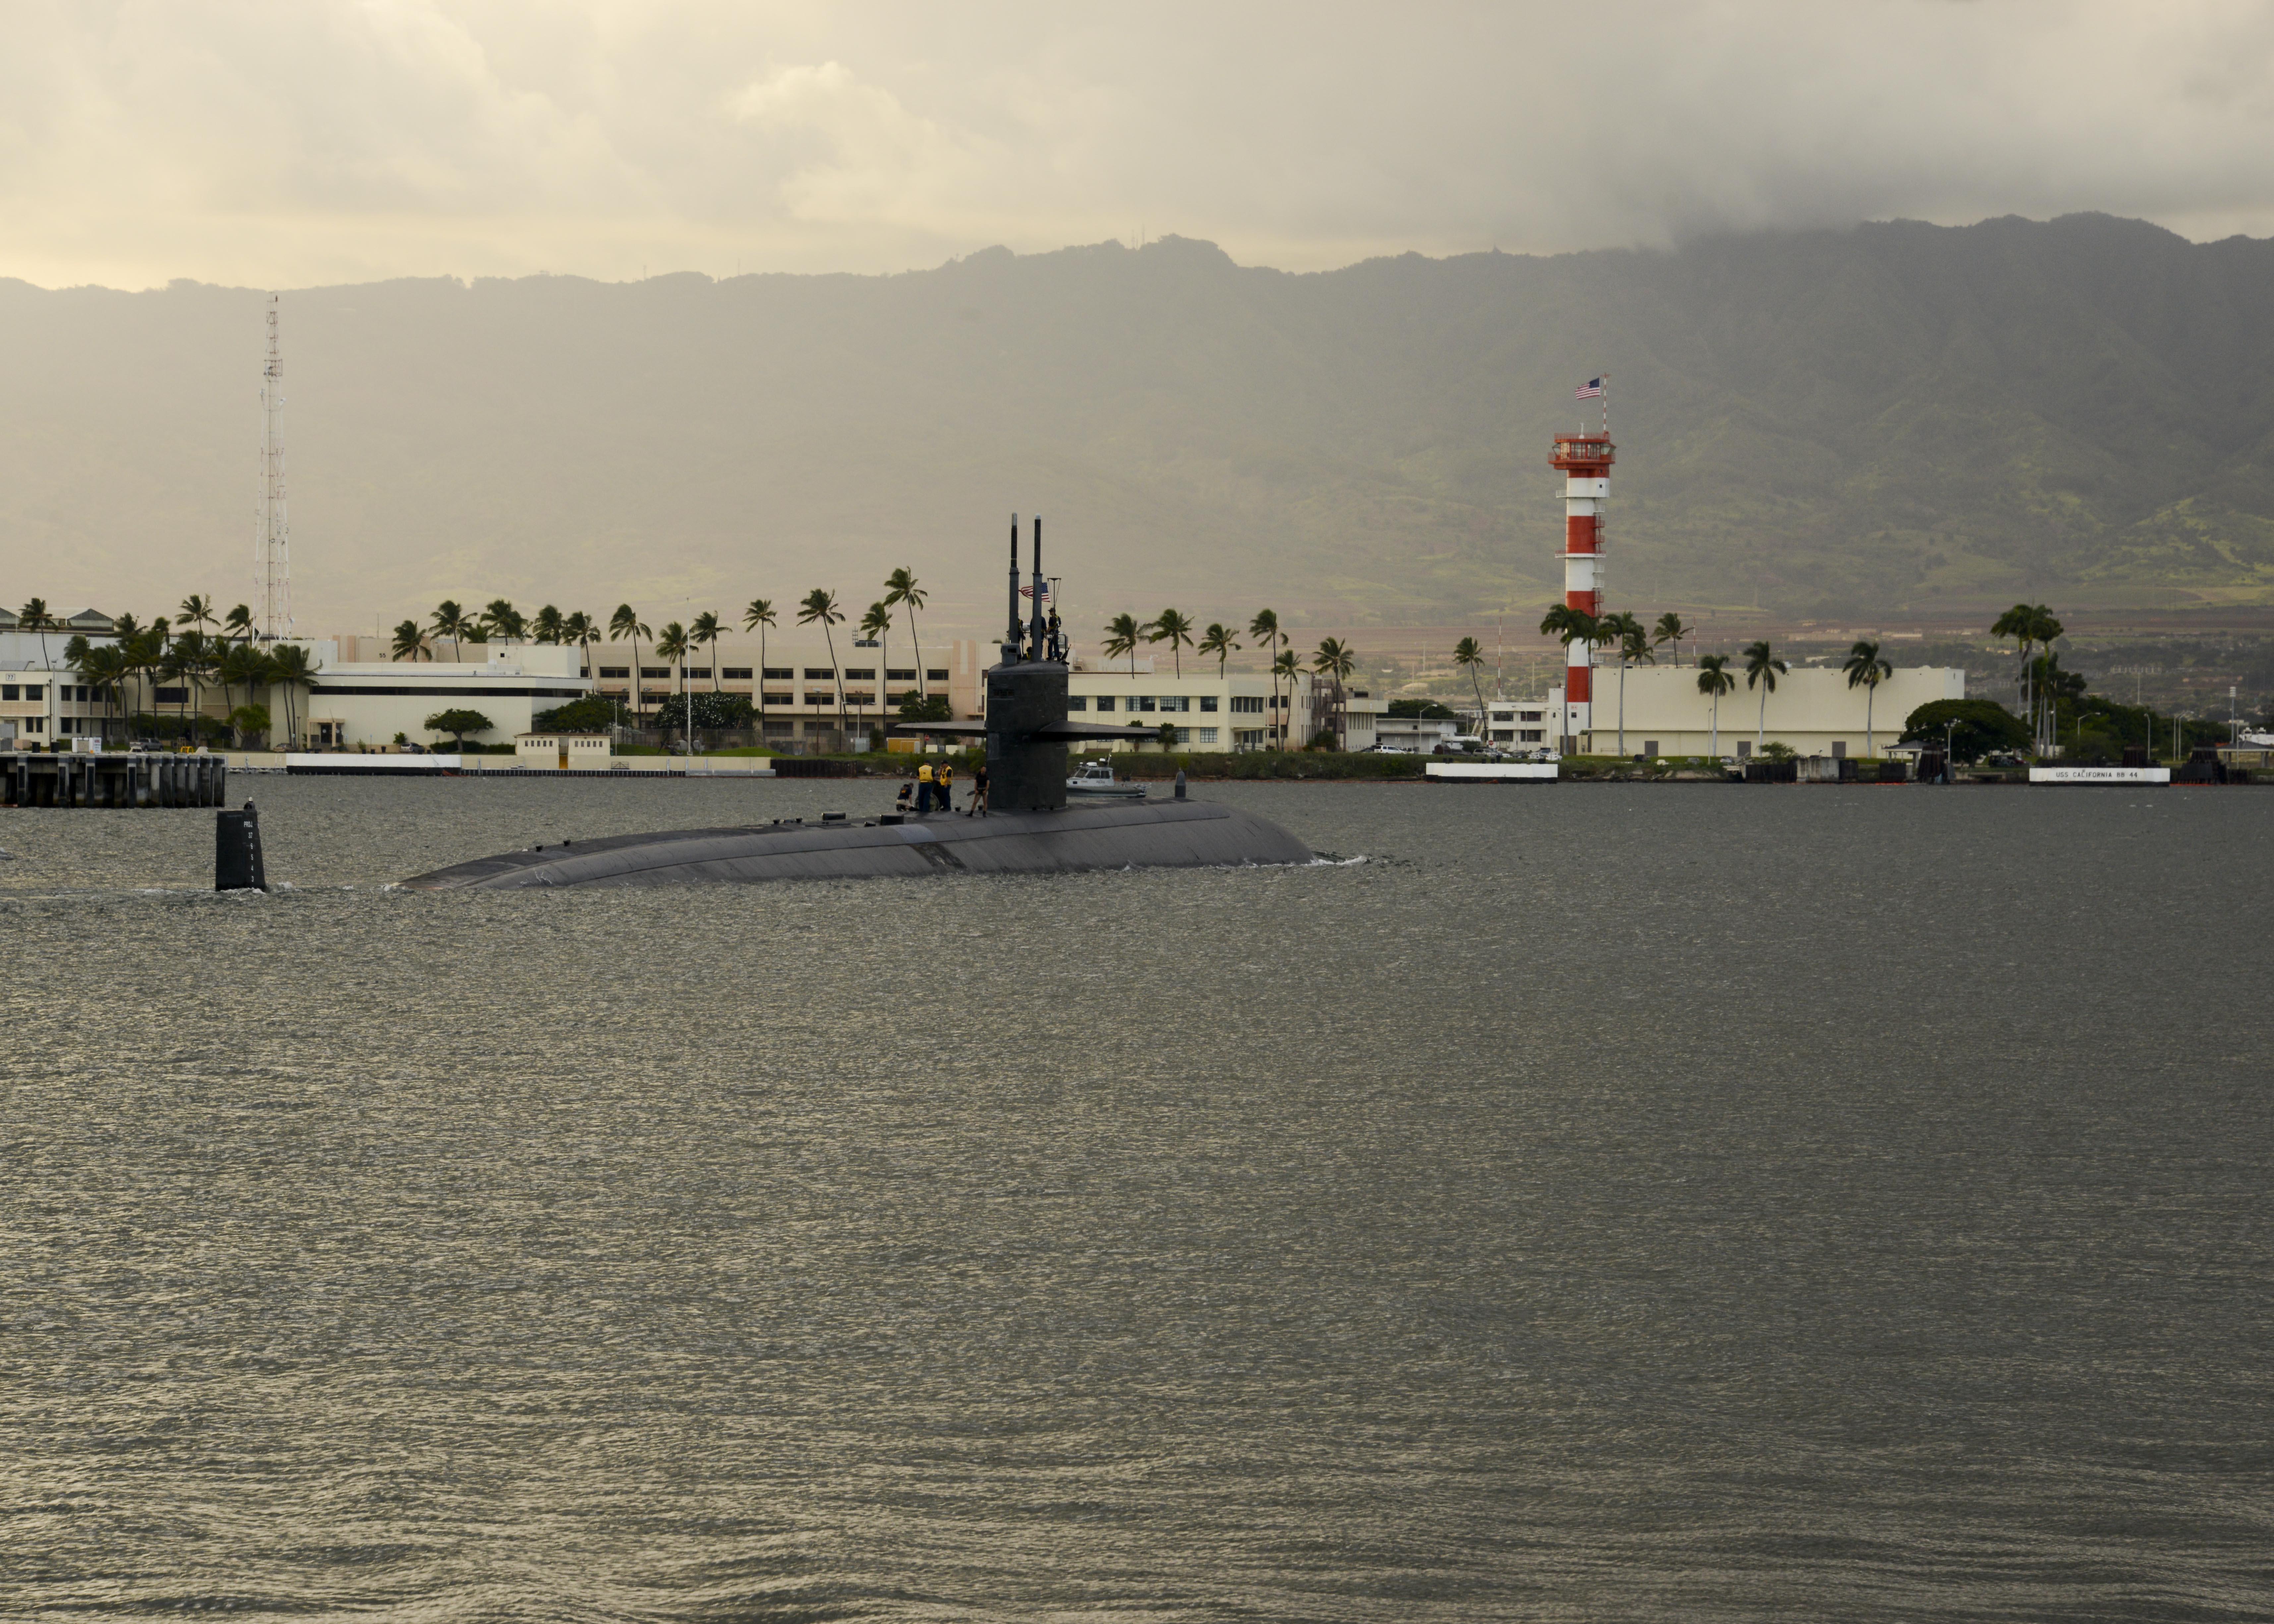 USS LA JOLLA SSN-701 Auslaufen Pearl Harbor am 15.10.2014 Bild: U.S. Navy